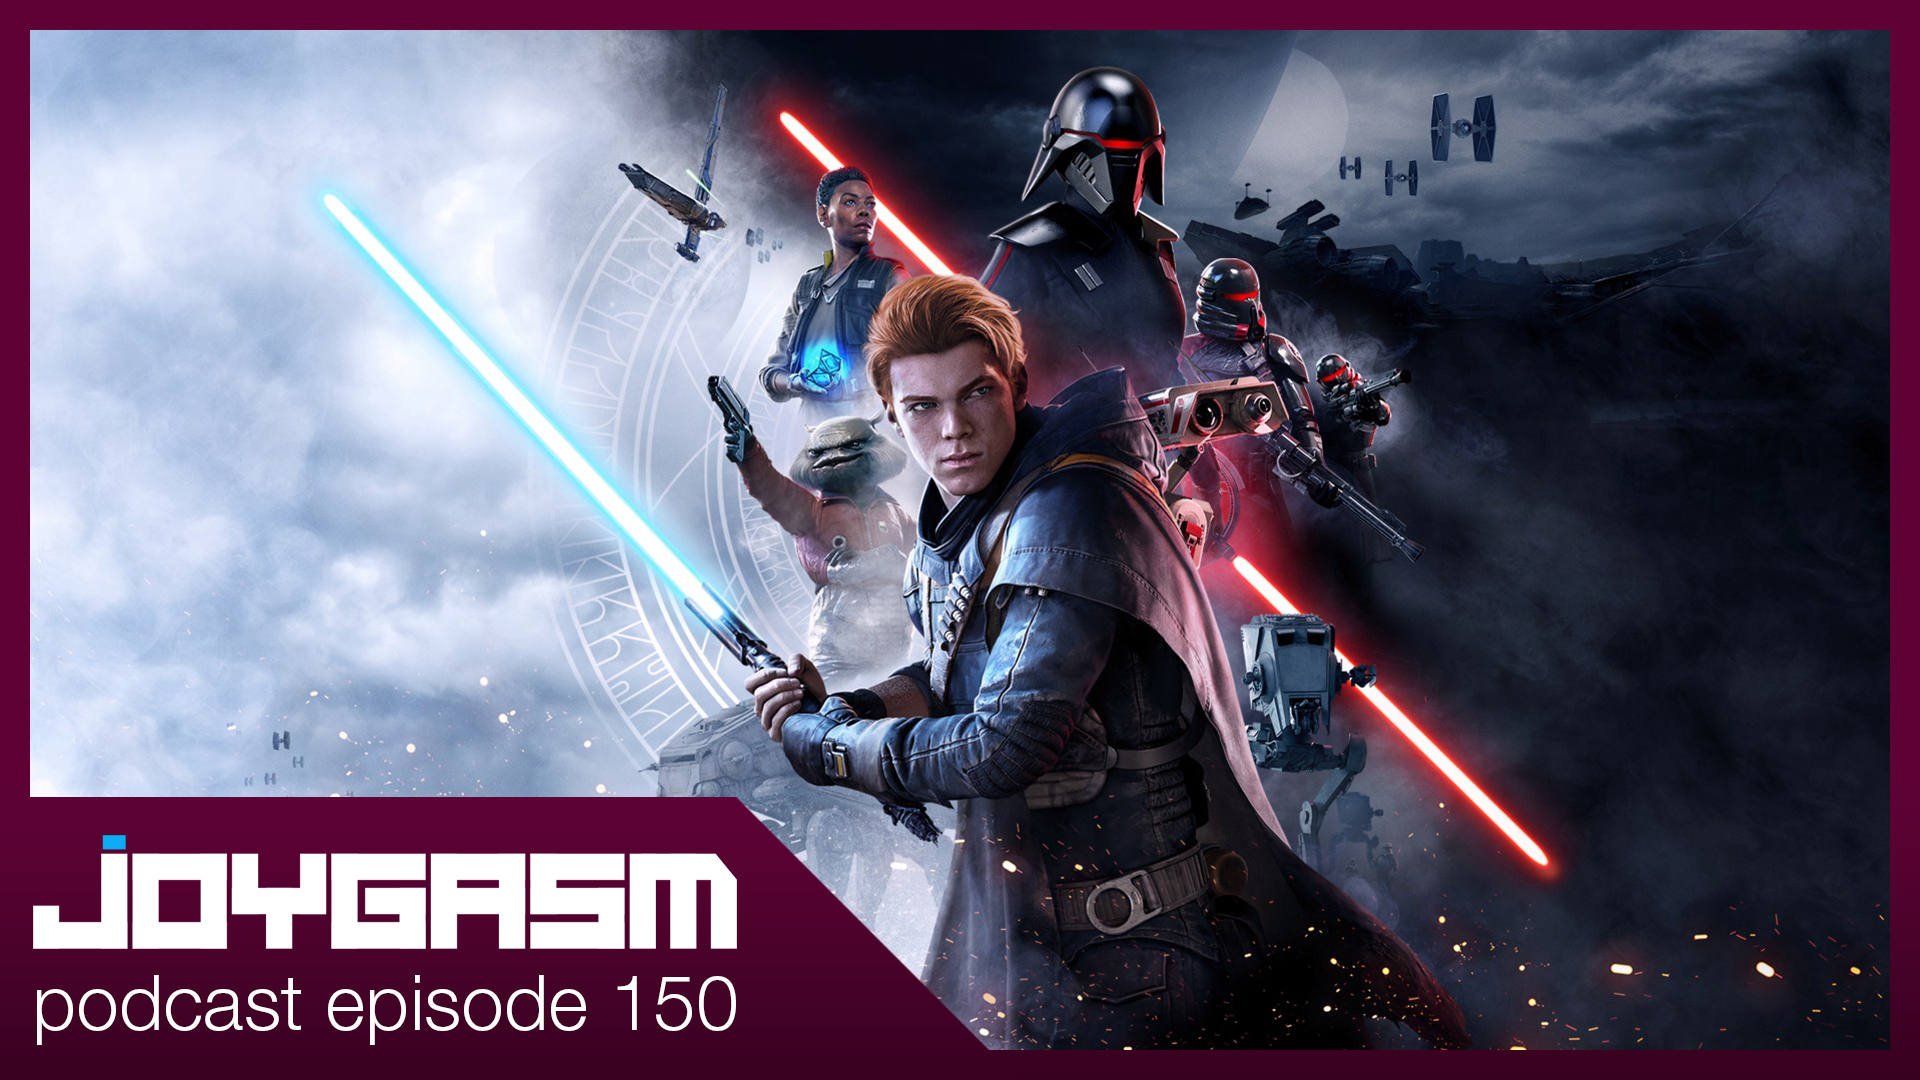 Ep. 150: Star Wars Jedi: Fallen Order & More